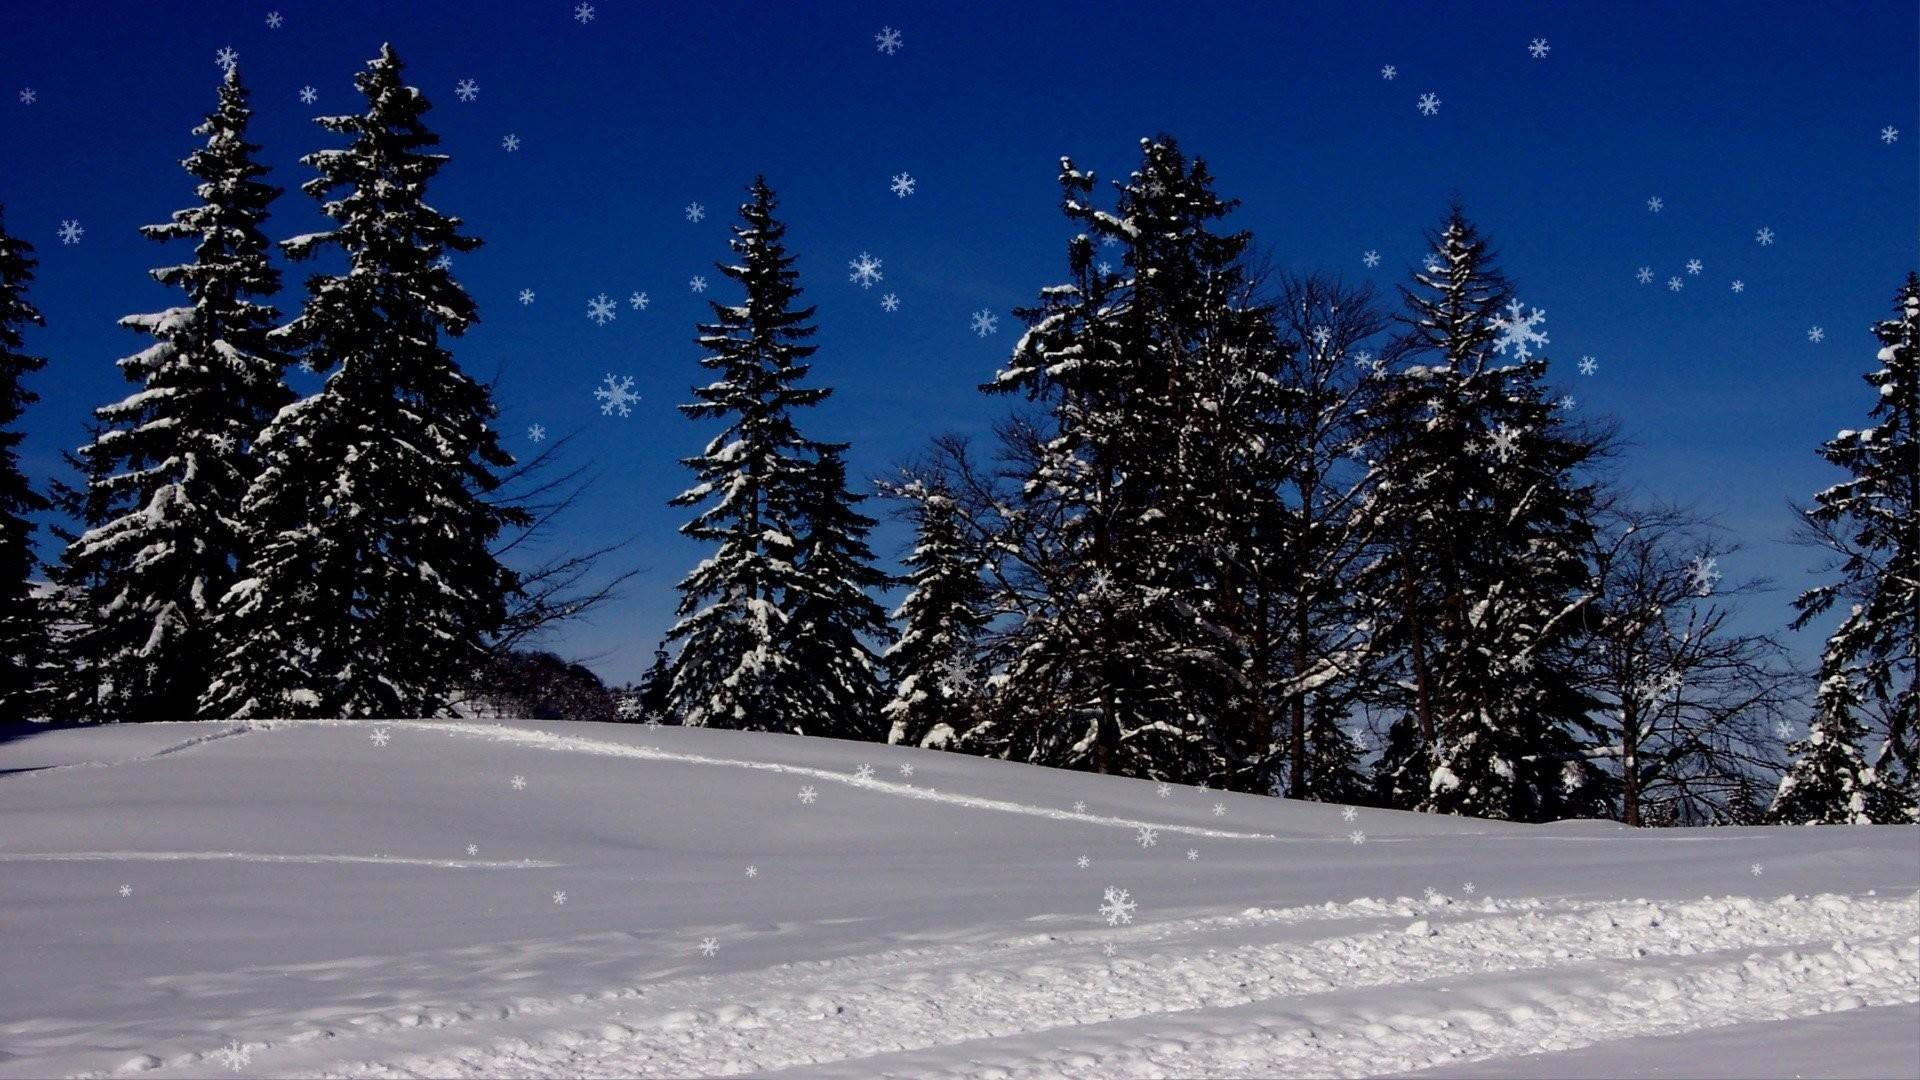 Animated Snow Background